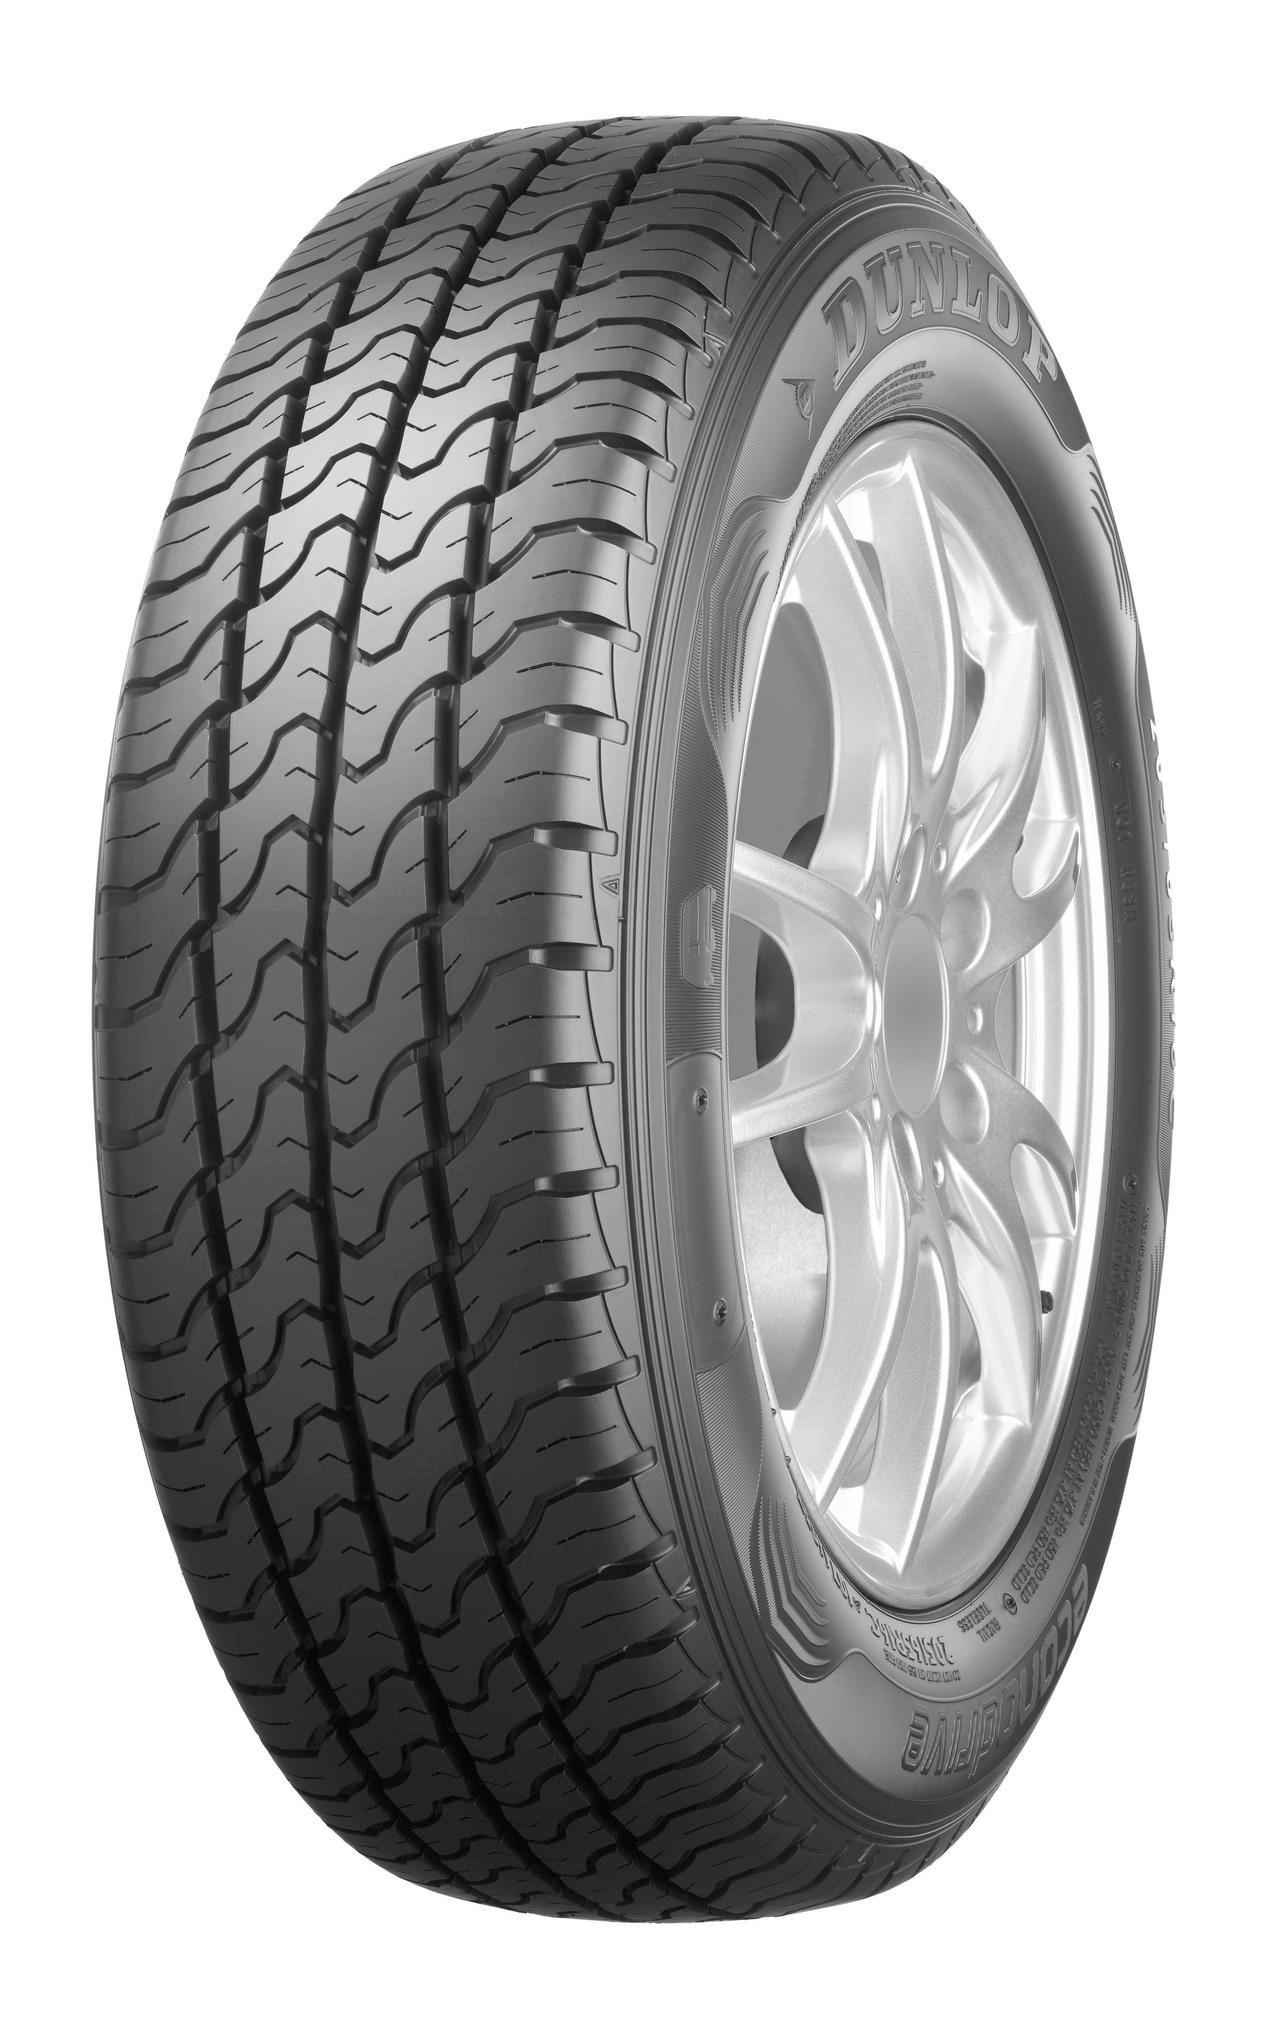 Dunlop Econodrive 195/75R16C 107/105R